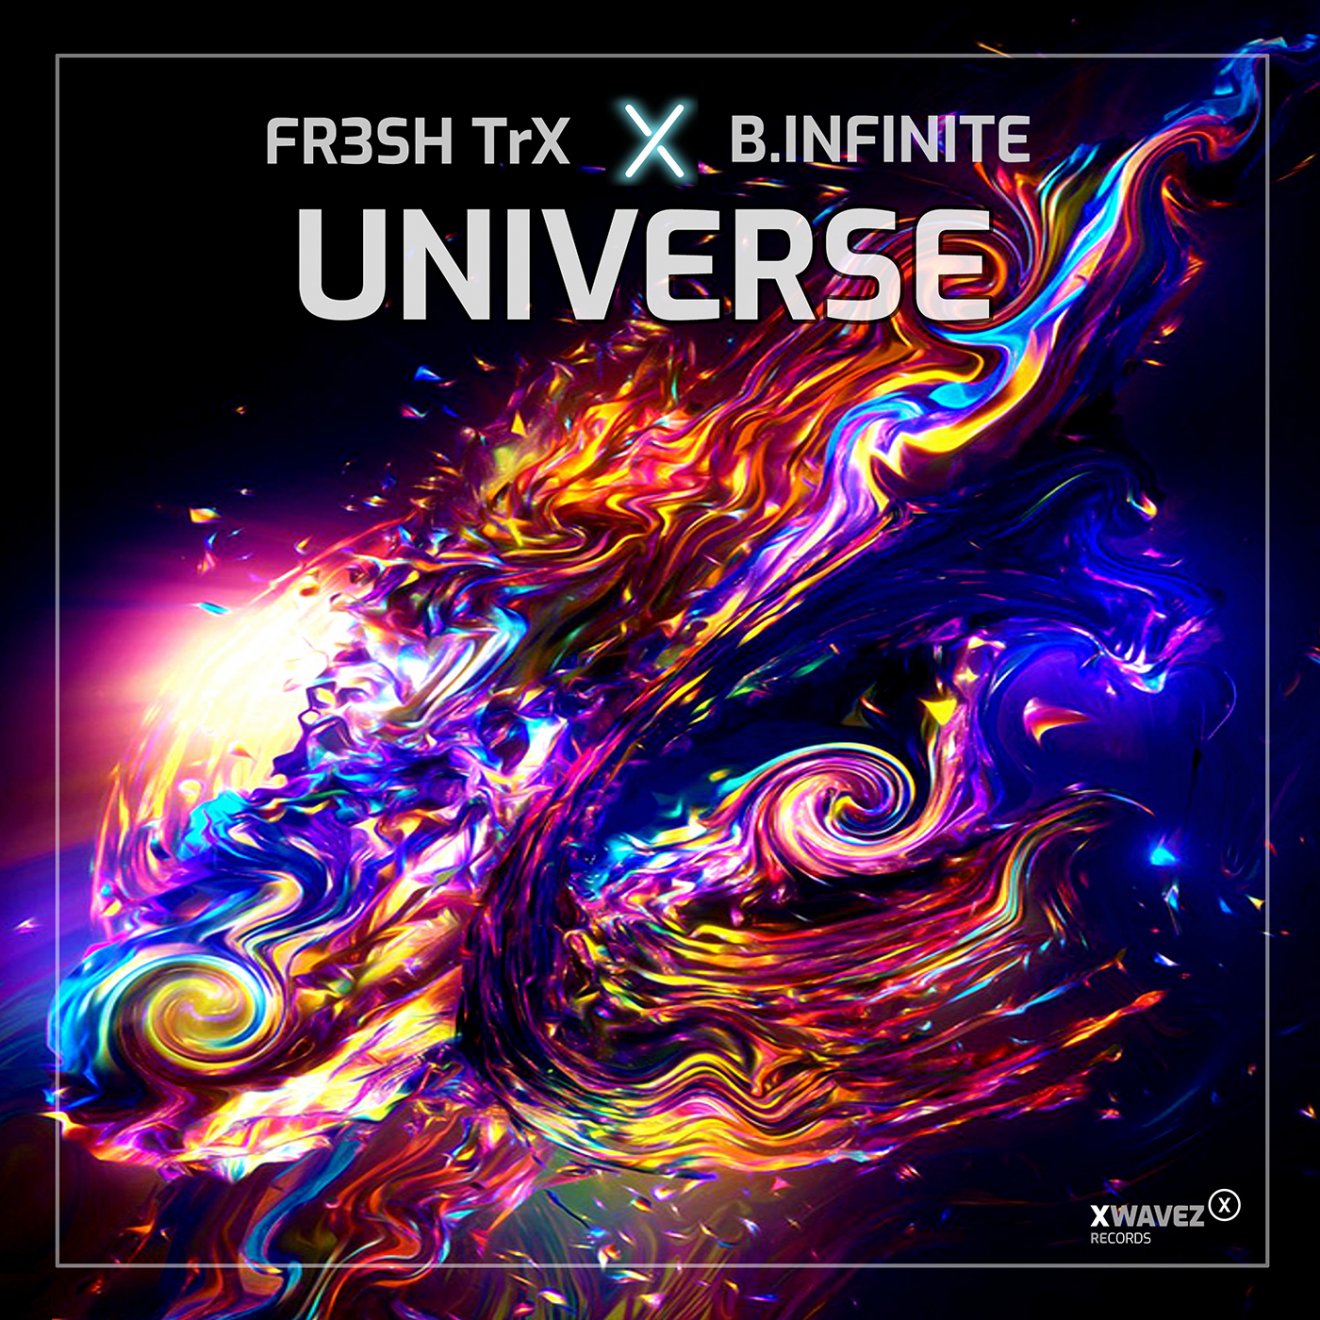 FR3SH TrX & B.Infinite - Universe